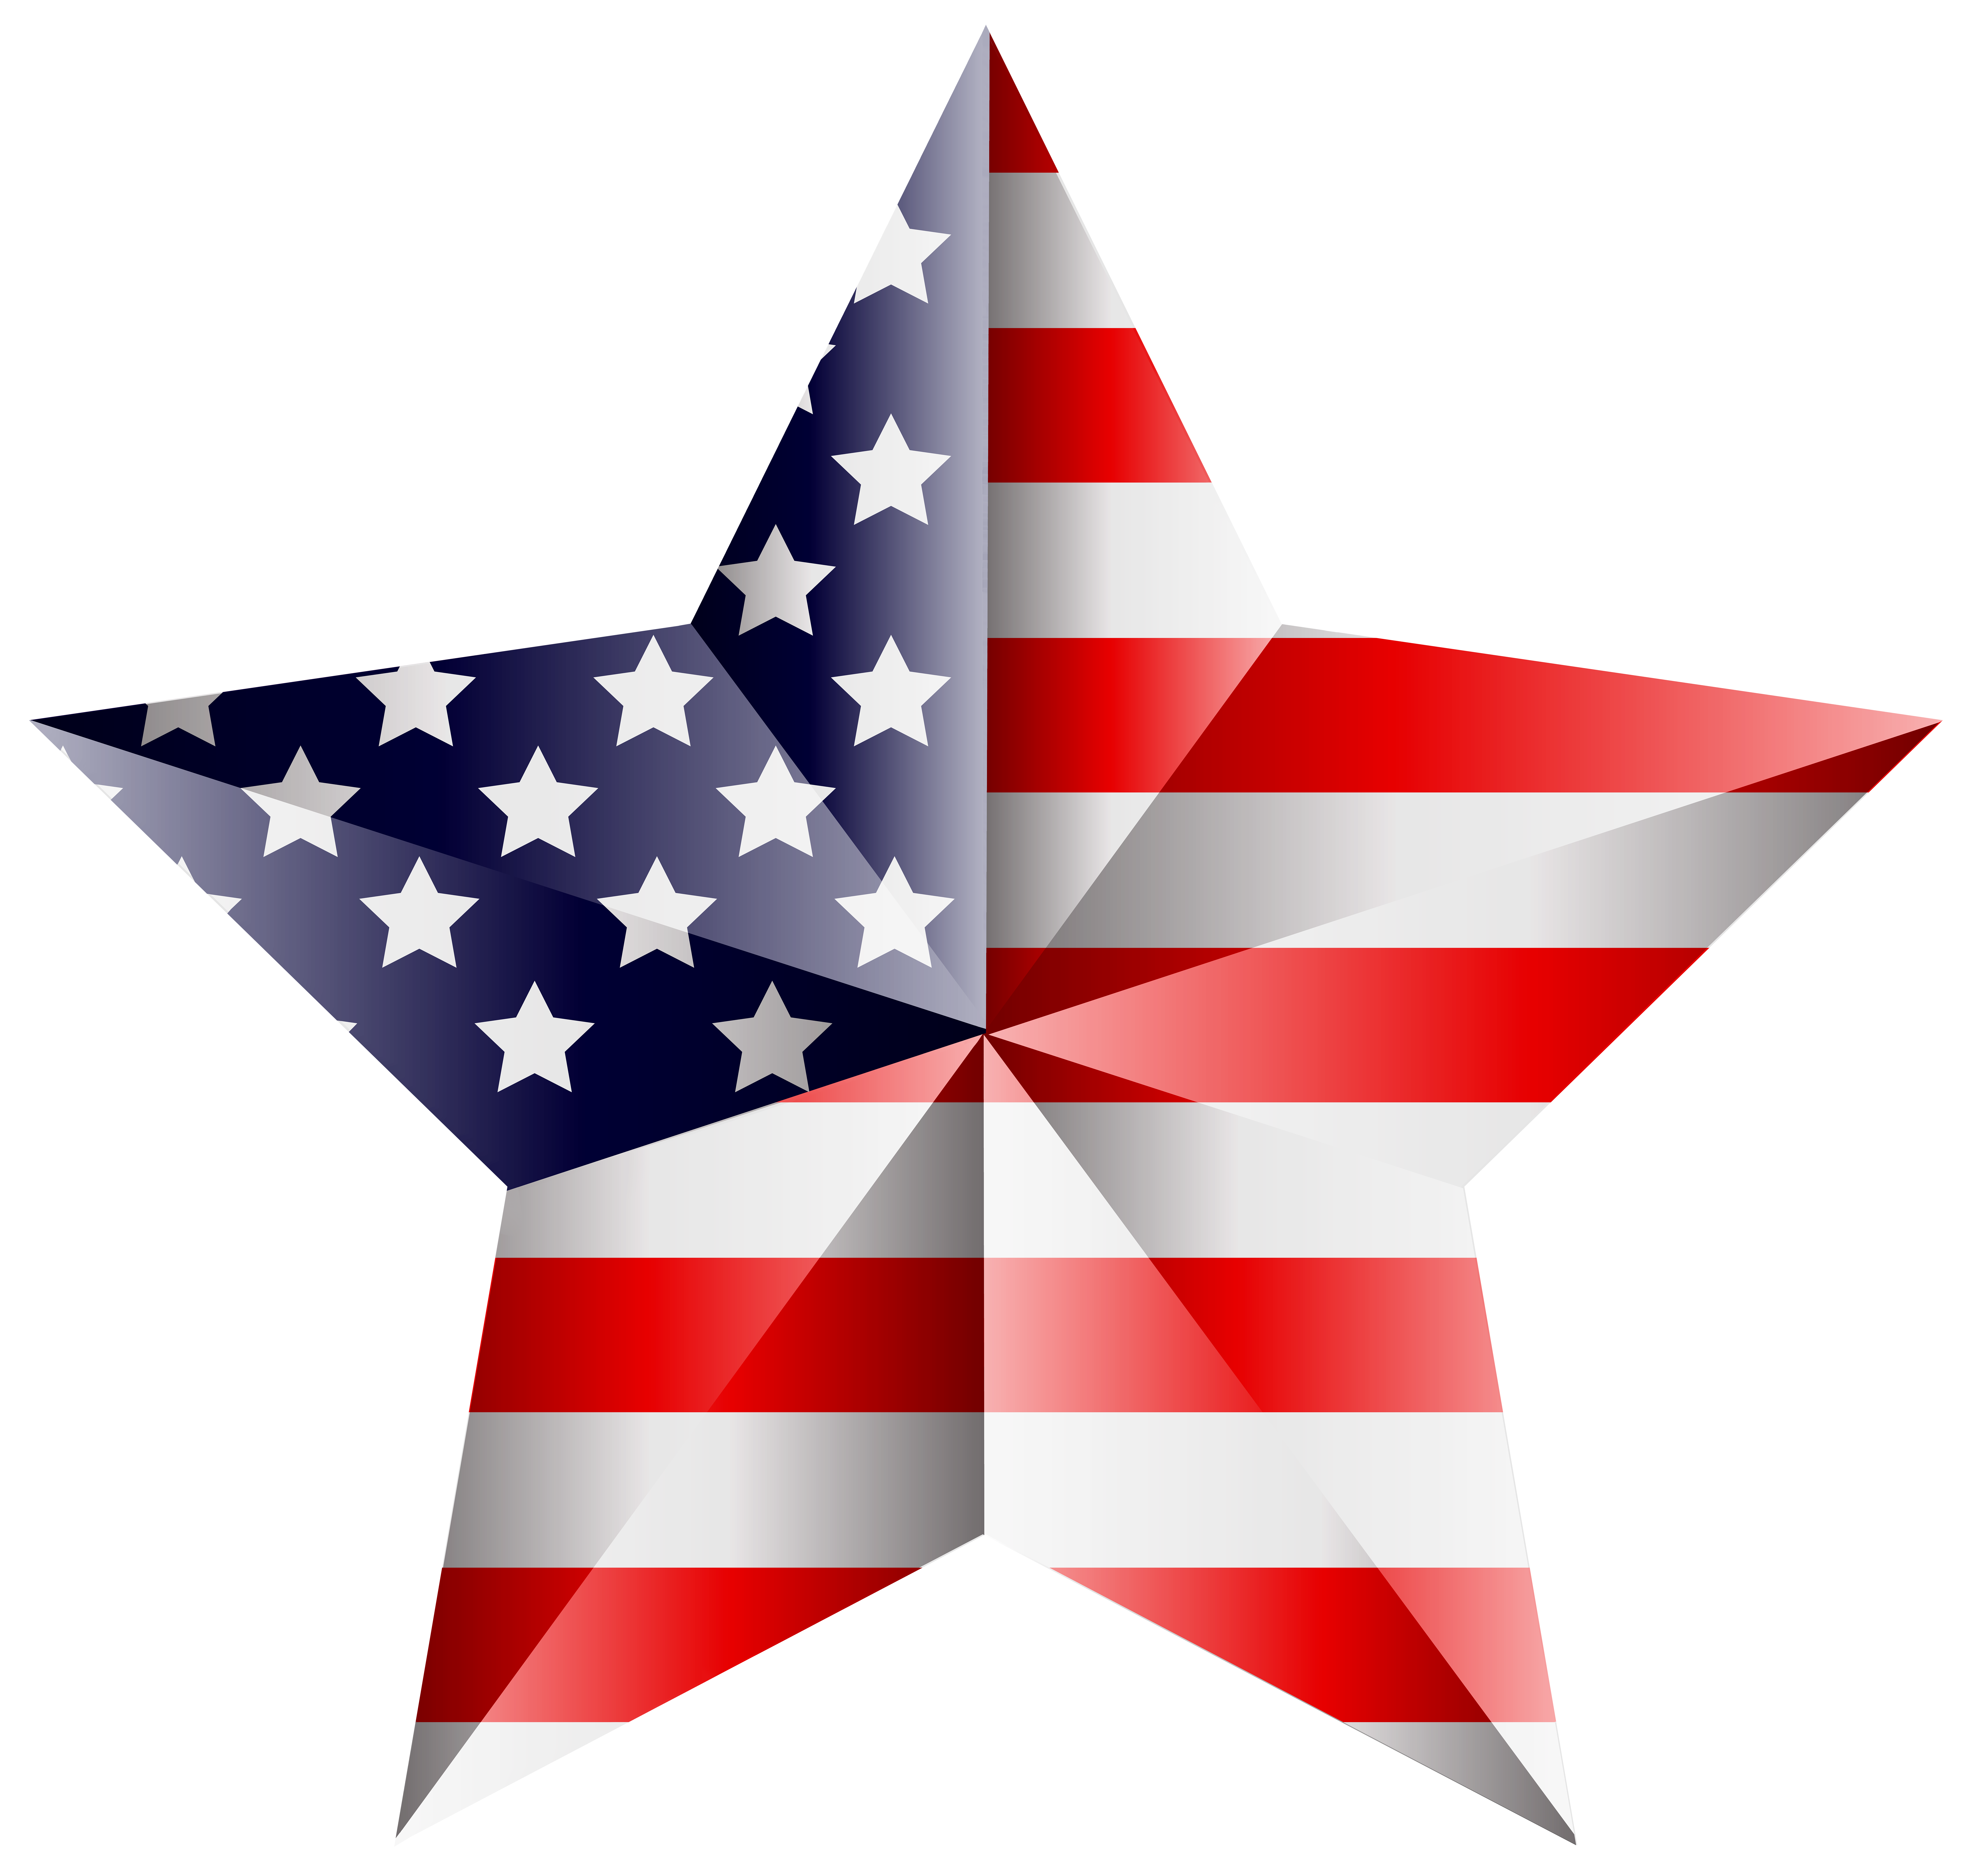 8000x7595 American Star Transparent Png Clip Art Imageu200b Gallery